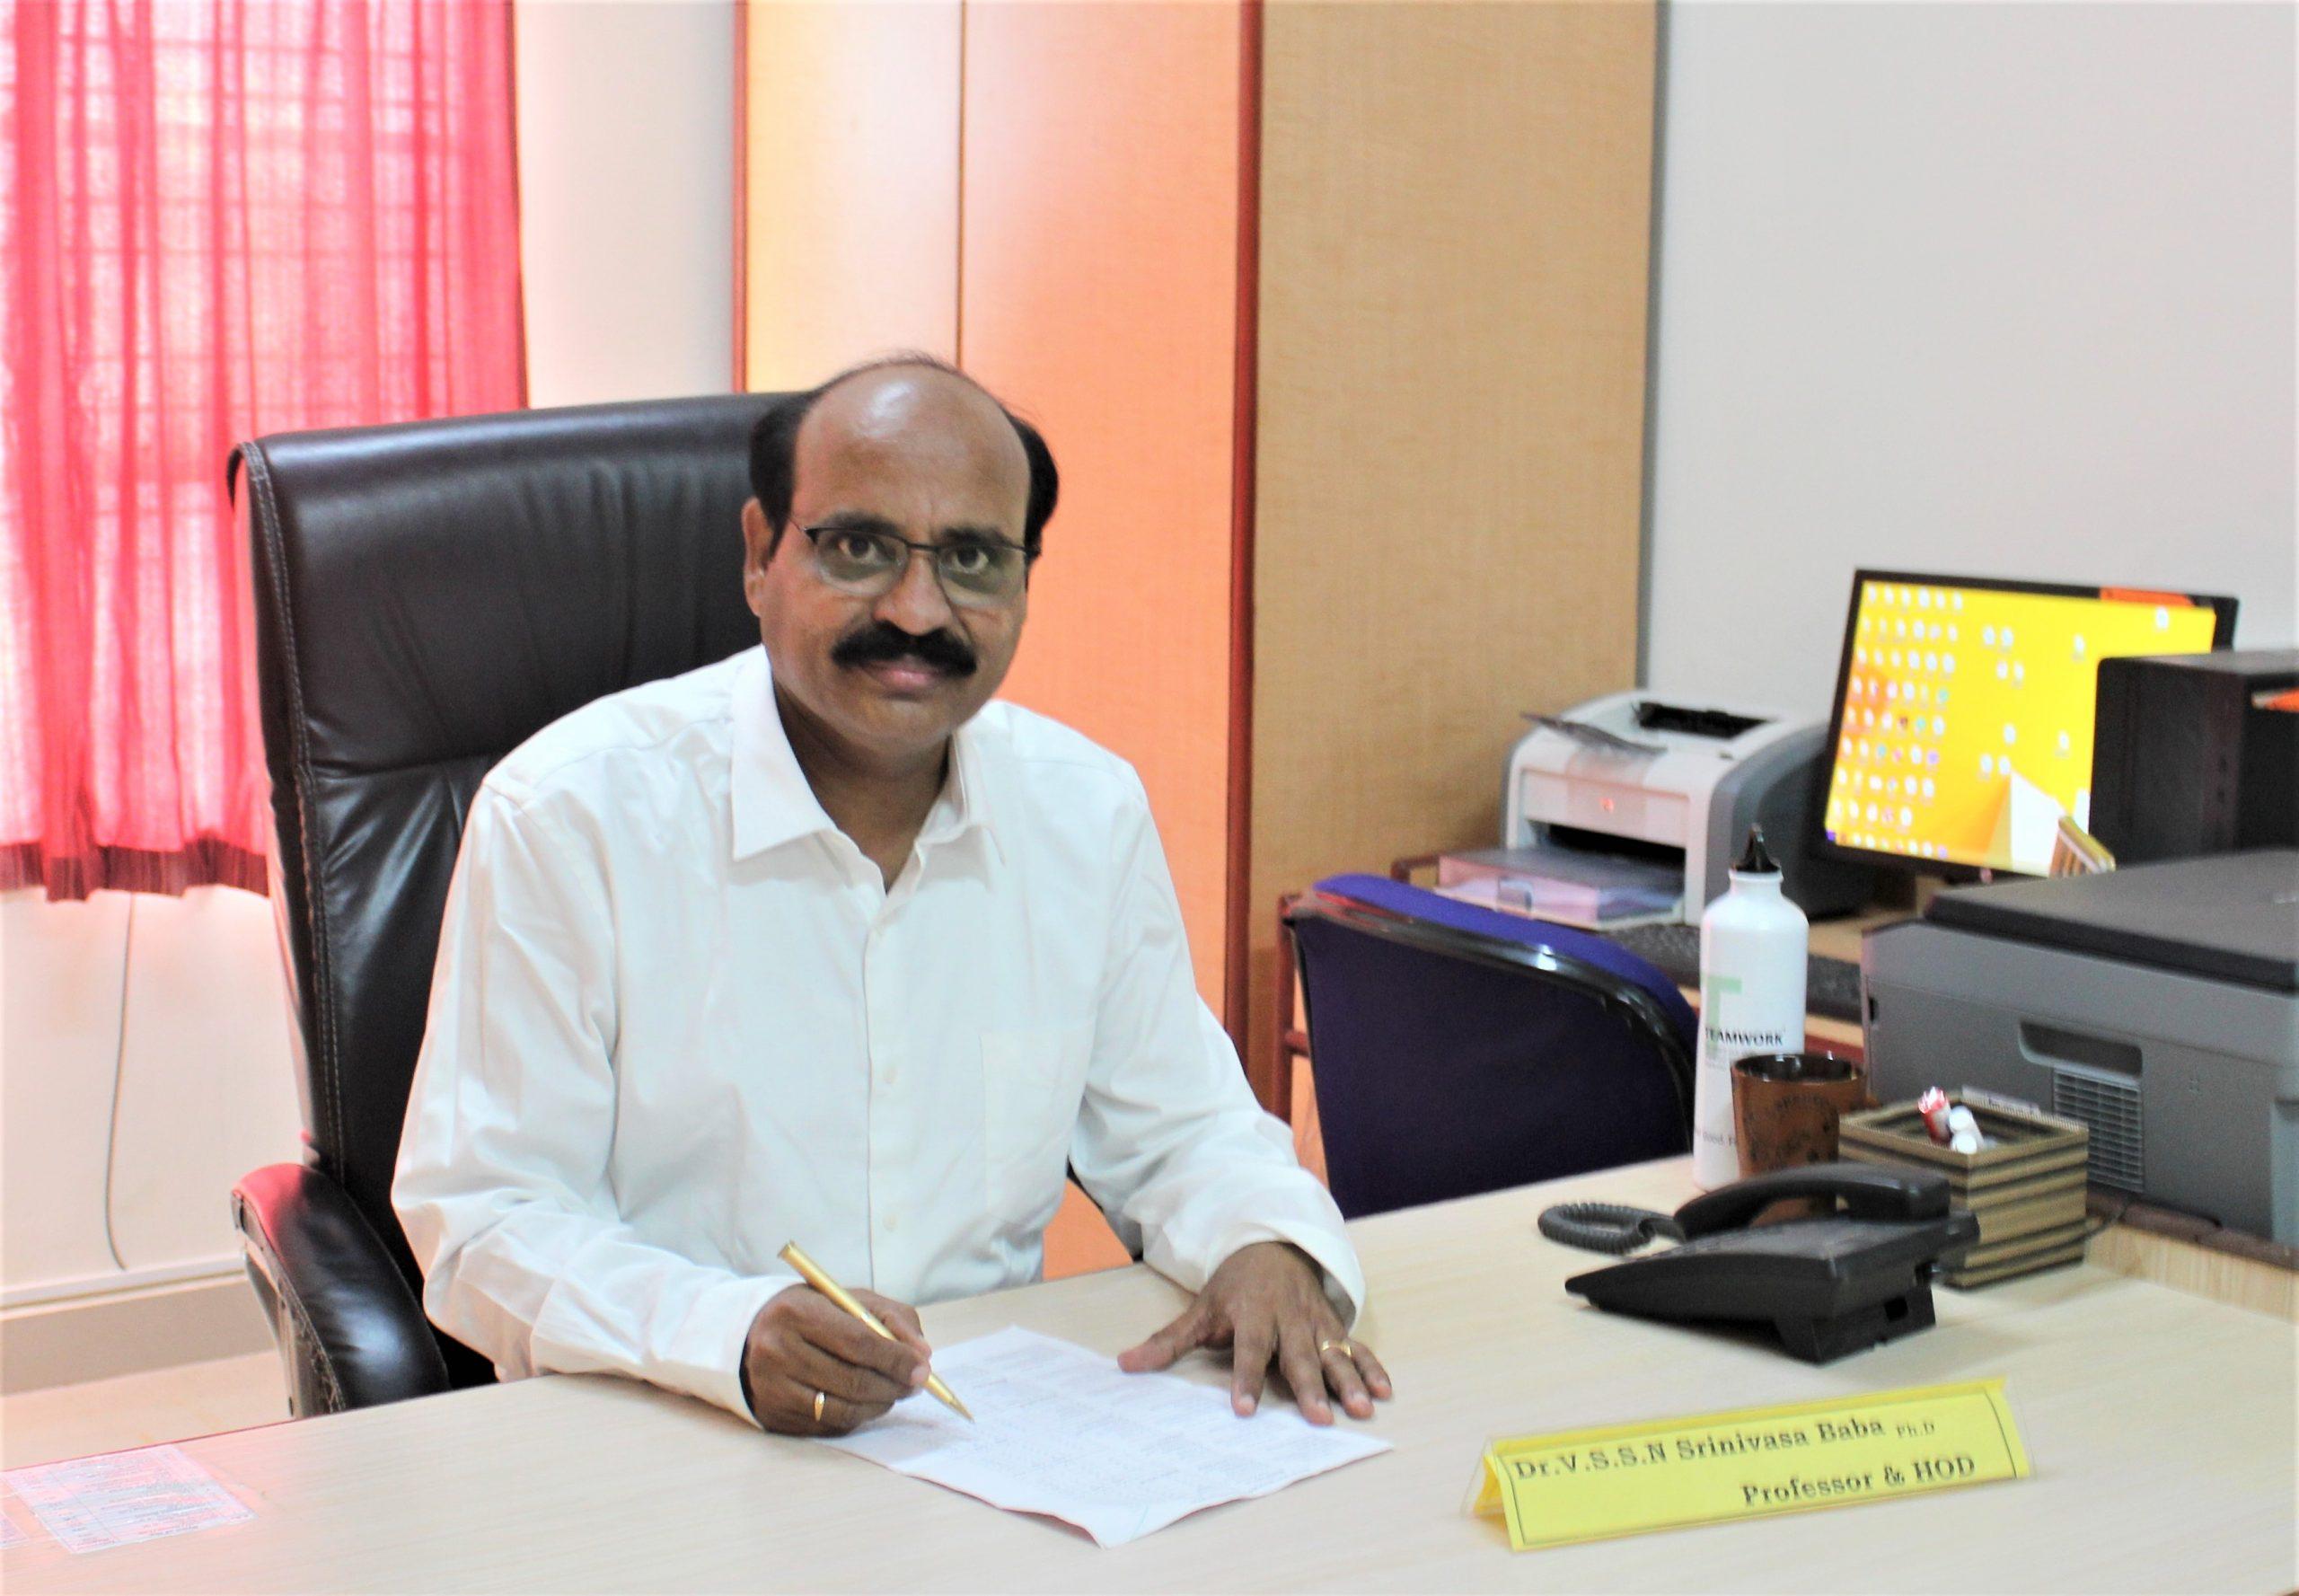 Dr. V. S. S. N. Srinivasa Baba